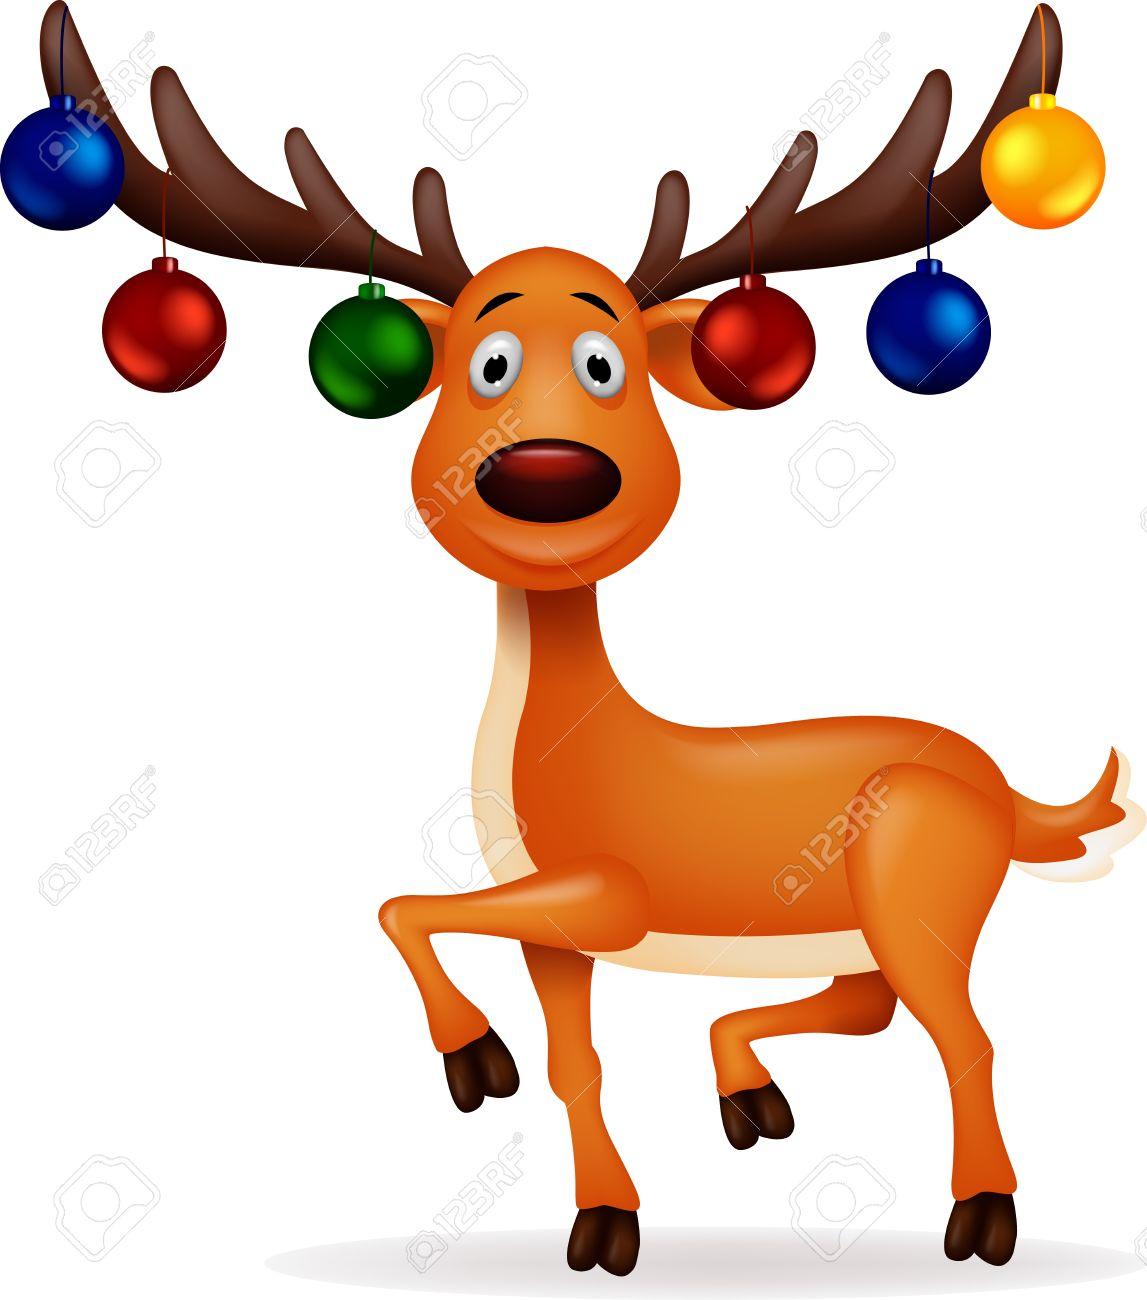 hight resolution of deer with christmas ball illustration